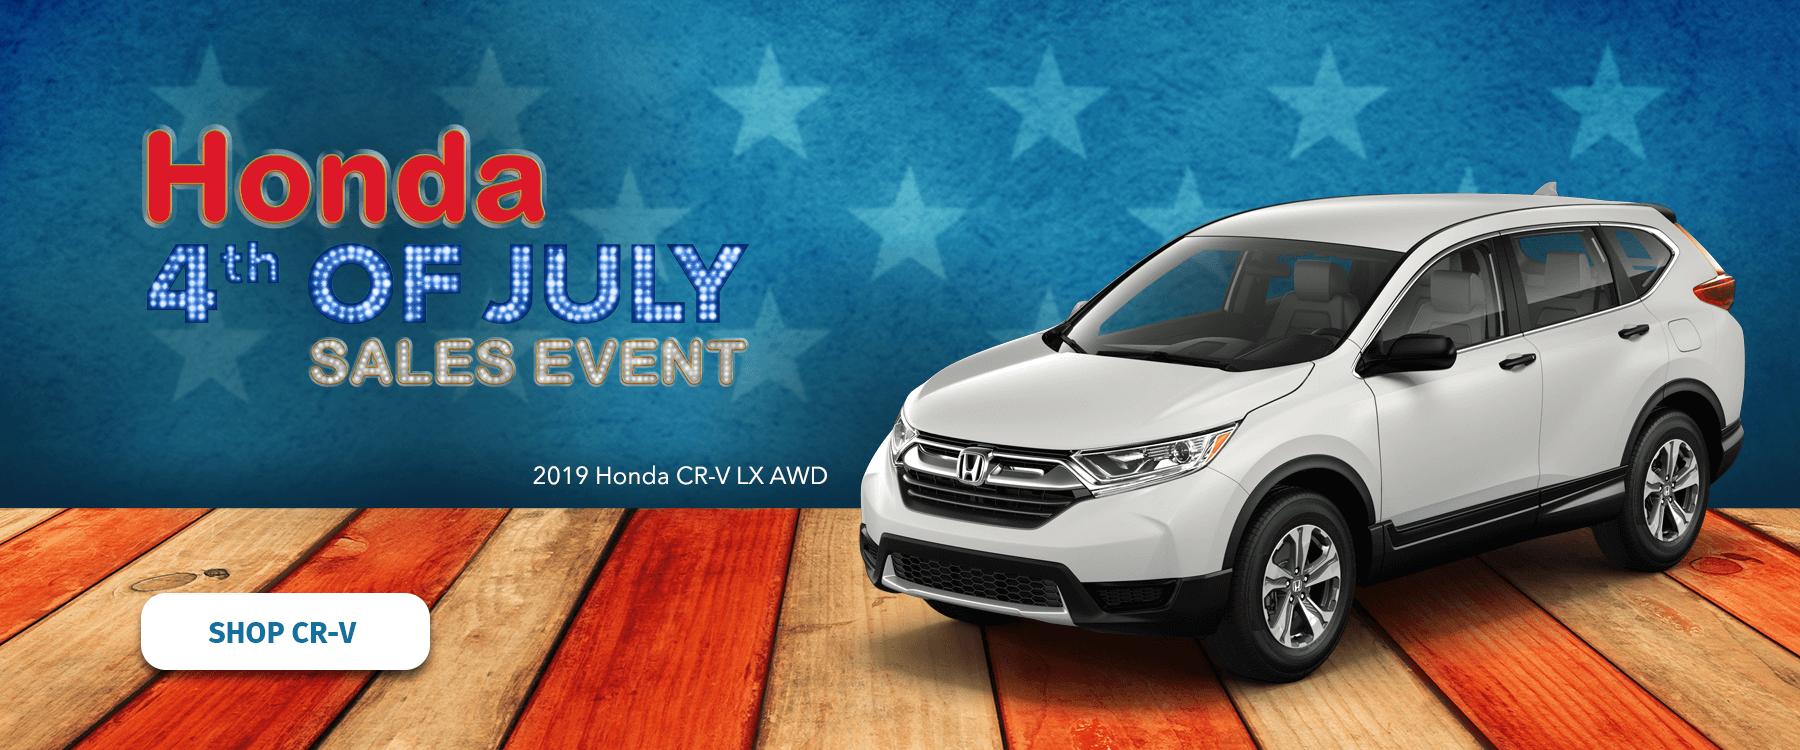 Honda 4th of July Sales Event 2019 CR-V Slider